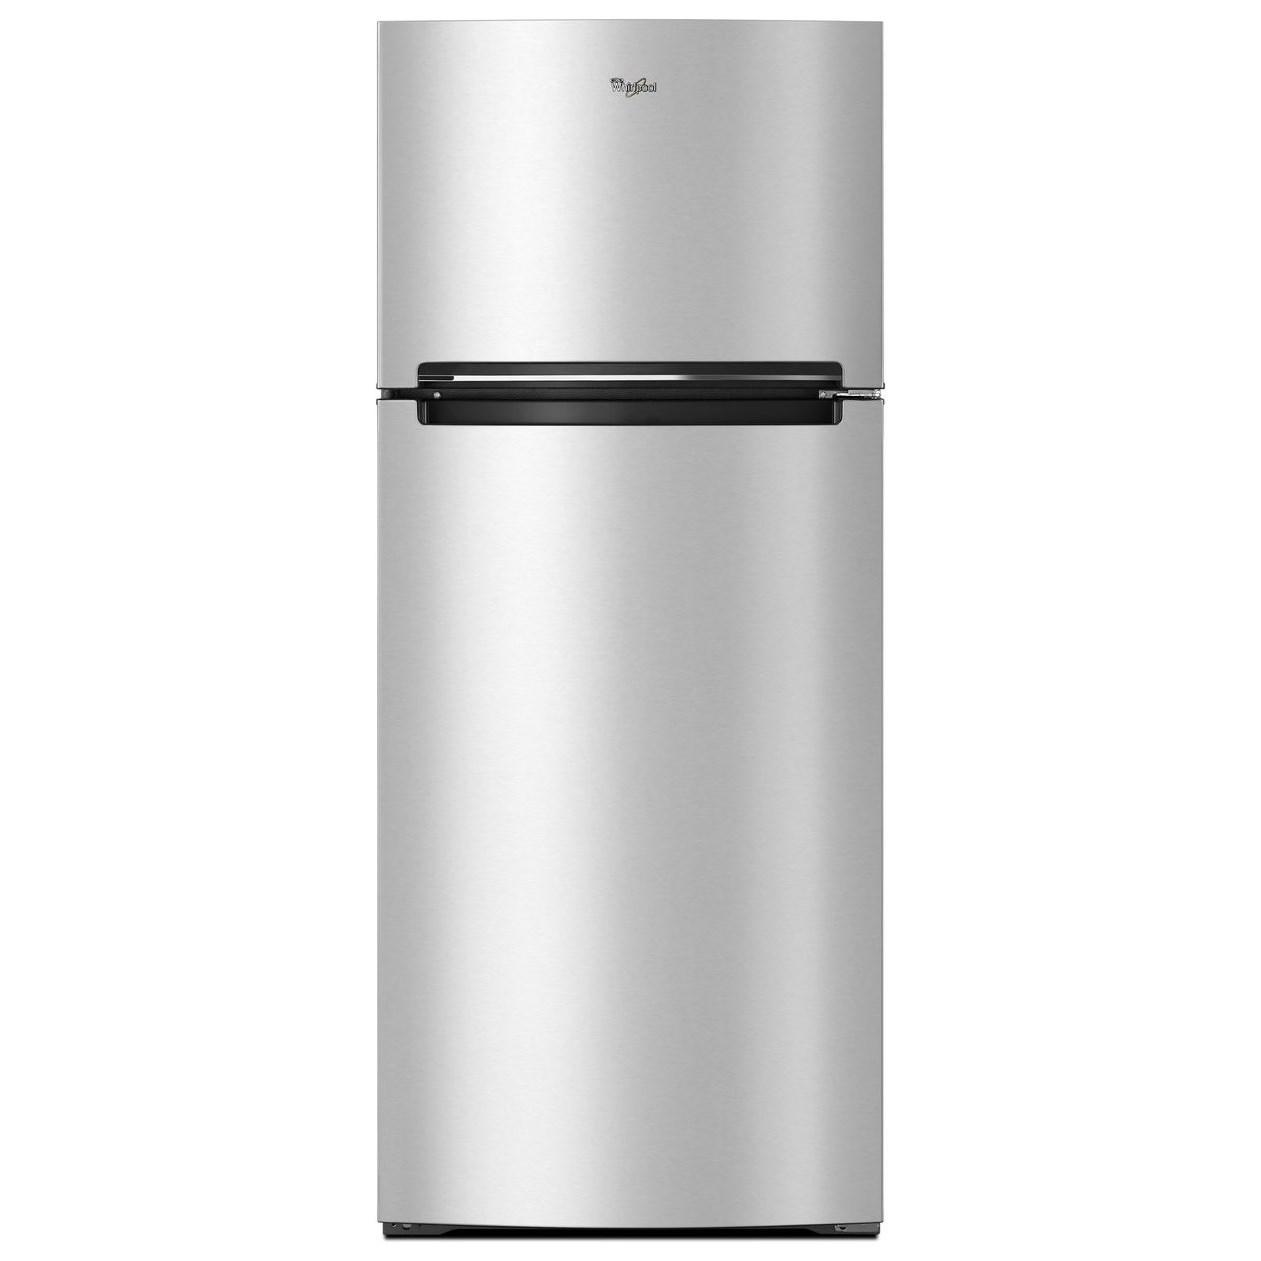 28-inch Wide Whirlpool® Refrigerator